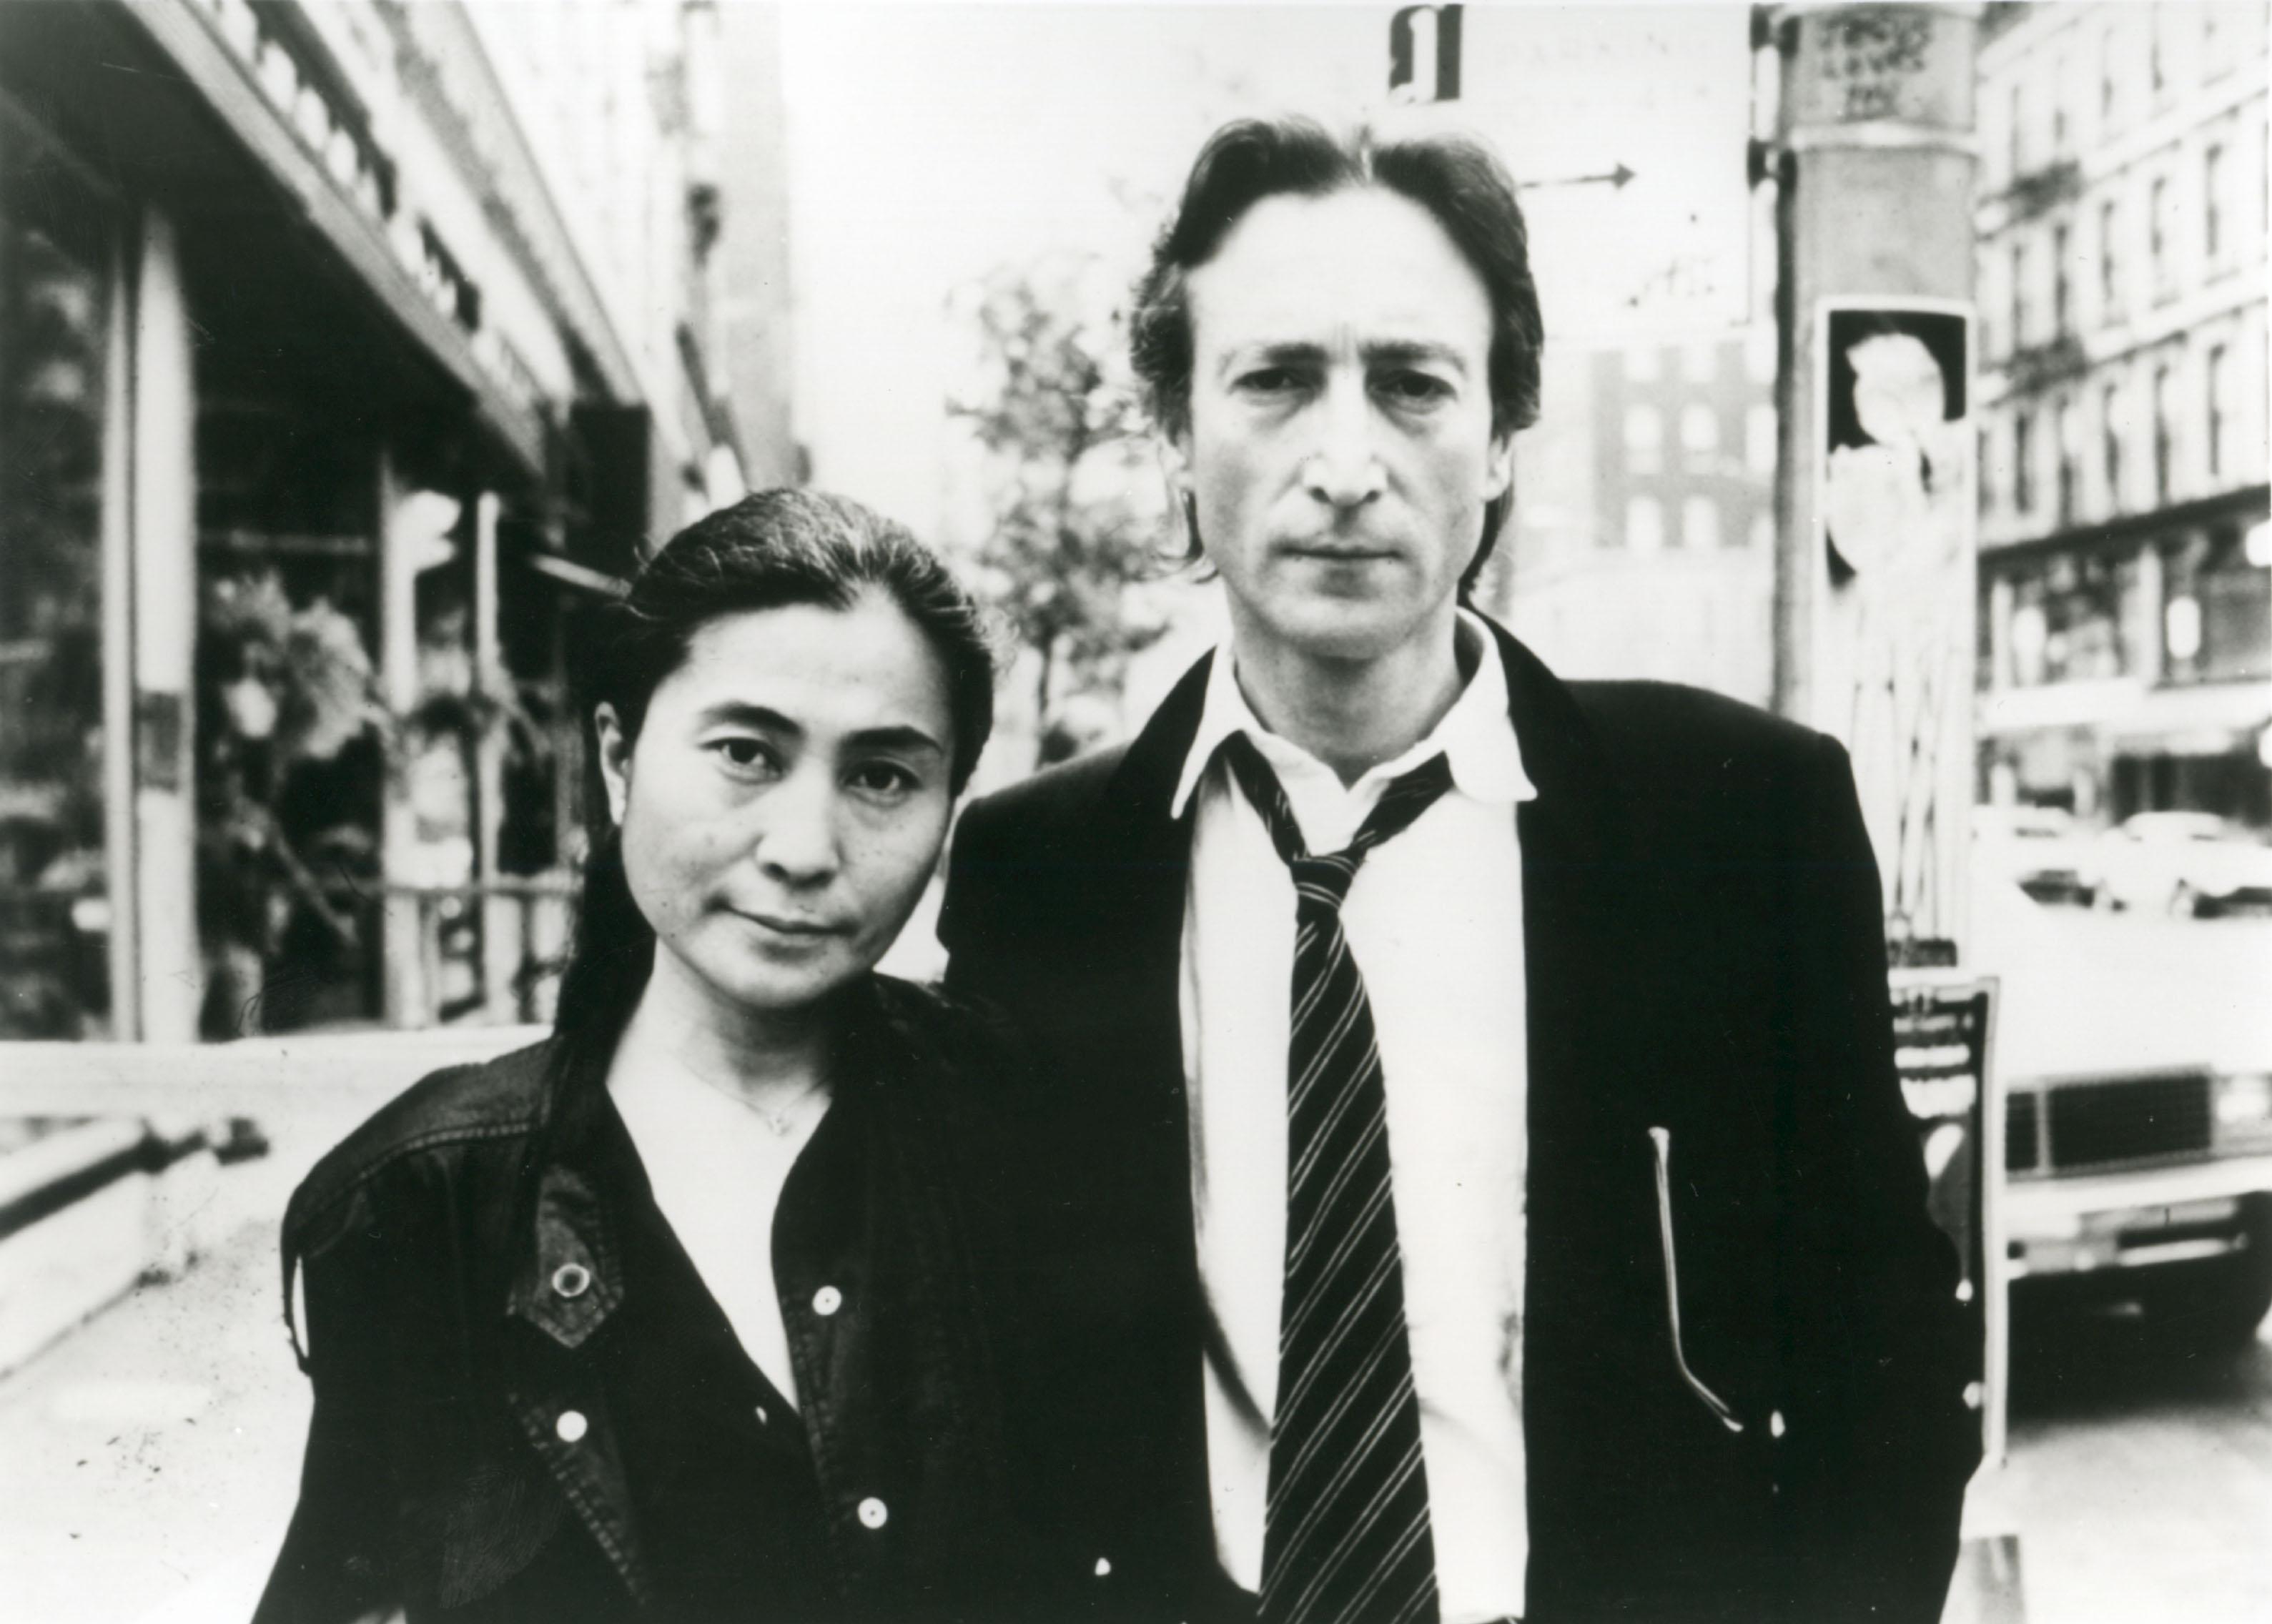 Magic Birds AP 1996 by John Lennon |Sketches John Lennon And Yoko Ono